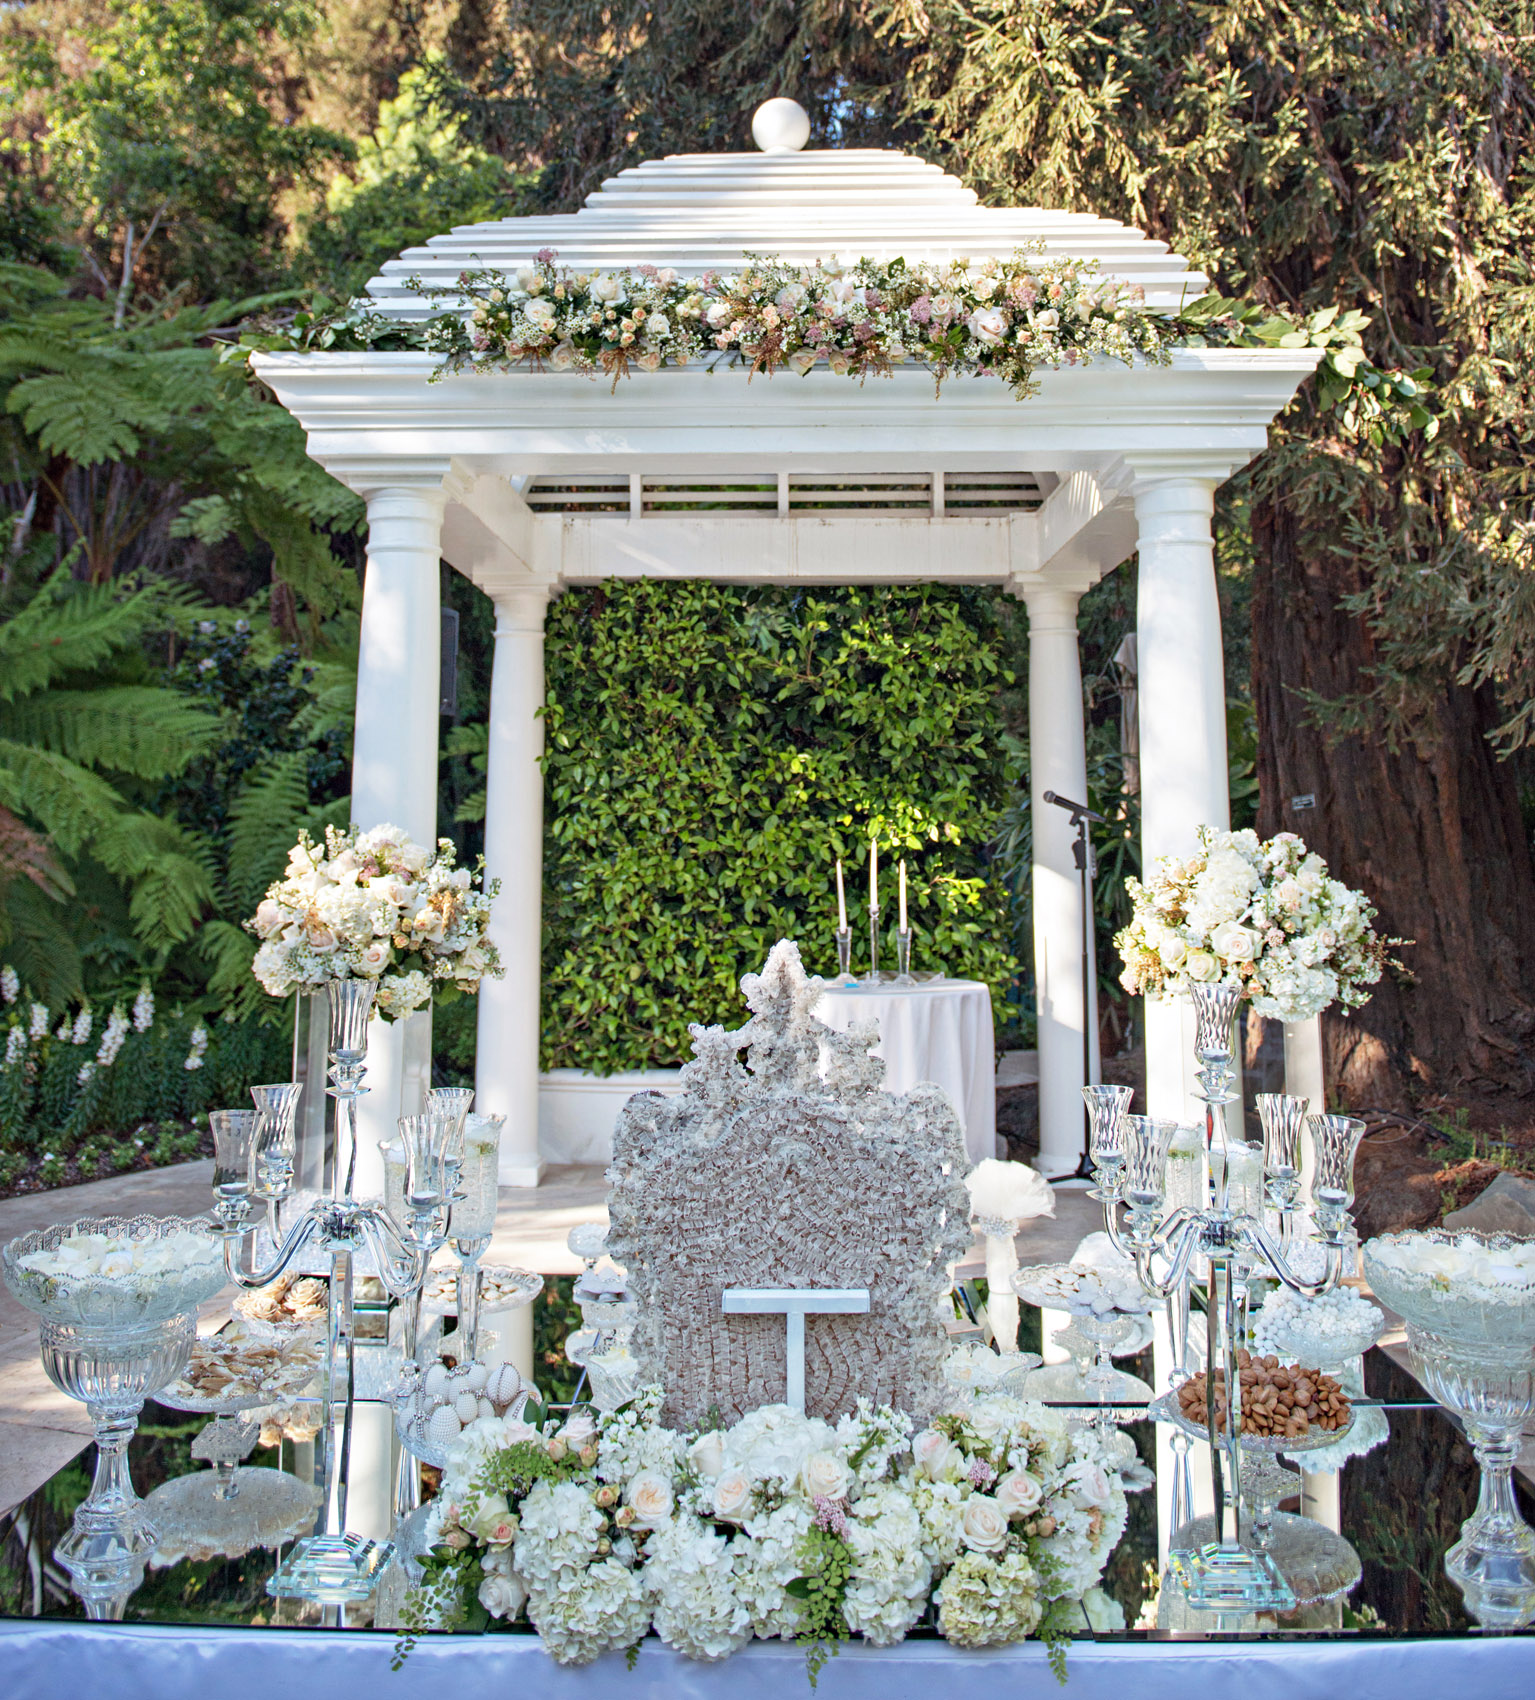 020Hotel Bel Air Wedding Joy Marie.jpg